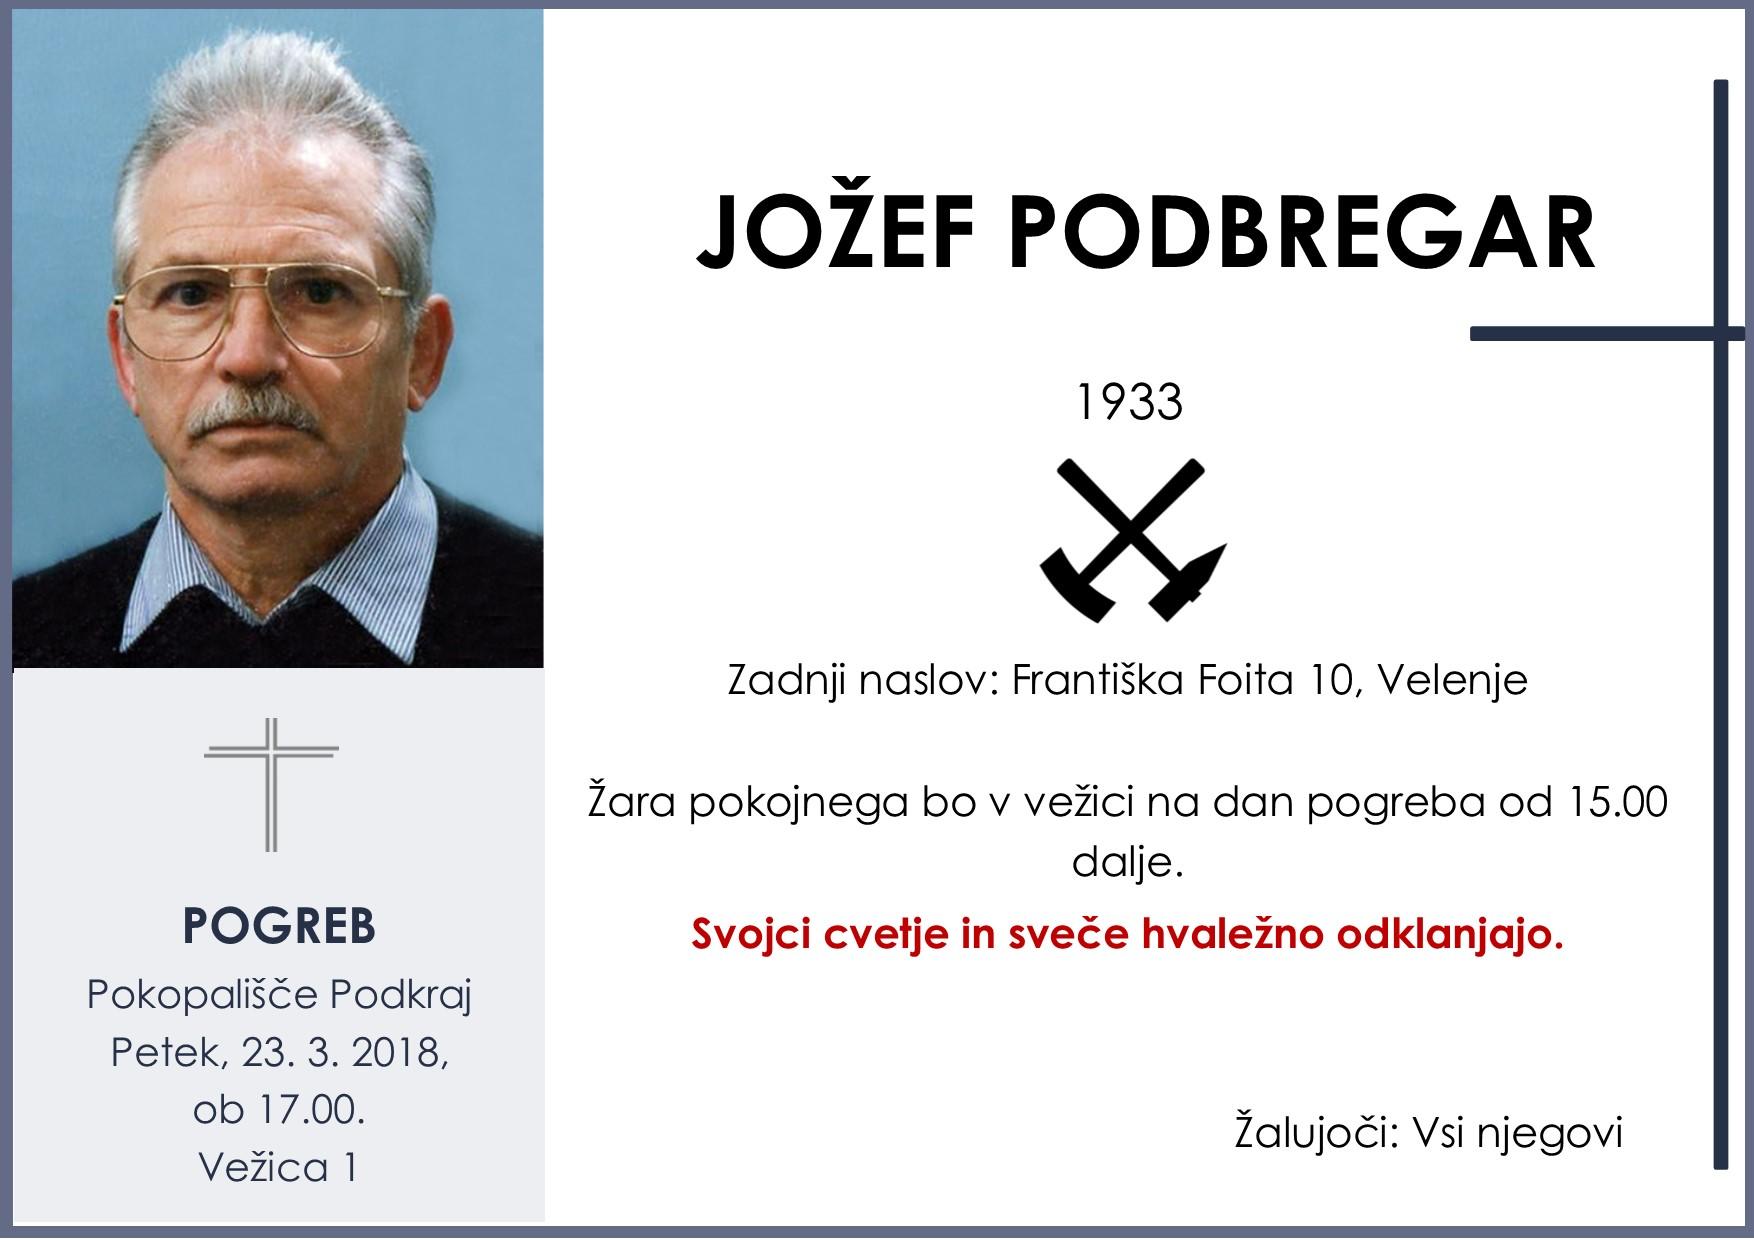 JOŽEF PODBREGAR, Podkraj, 23. 03. 2018